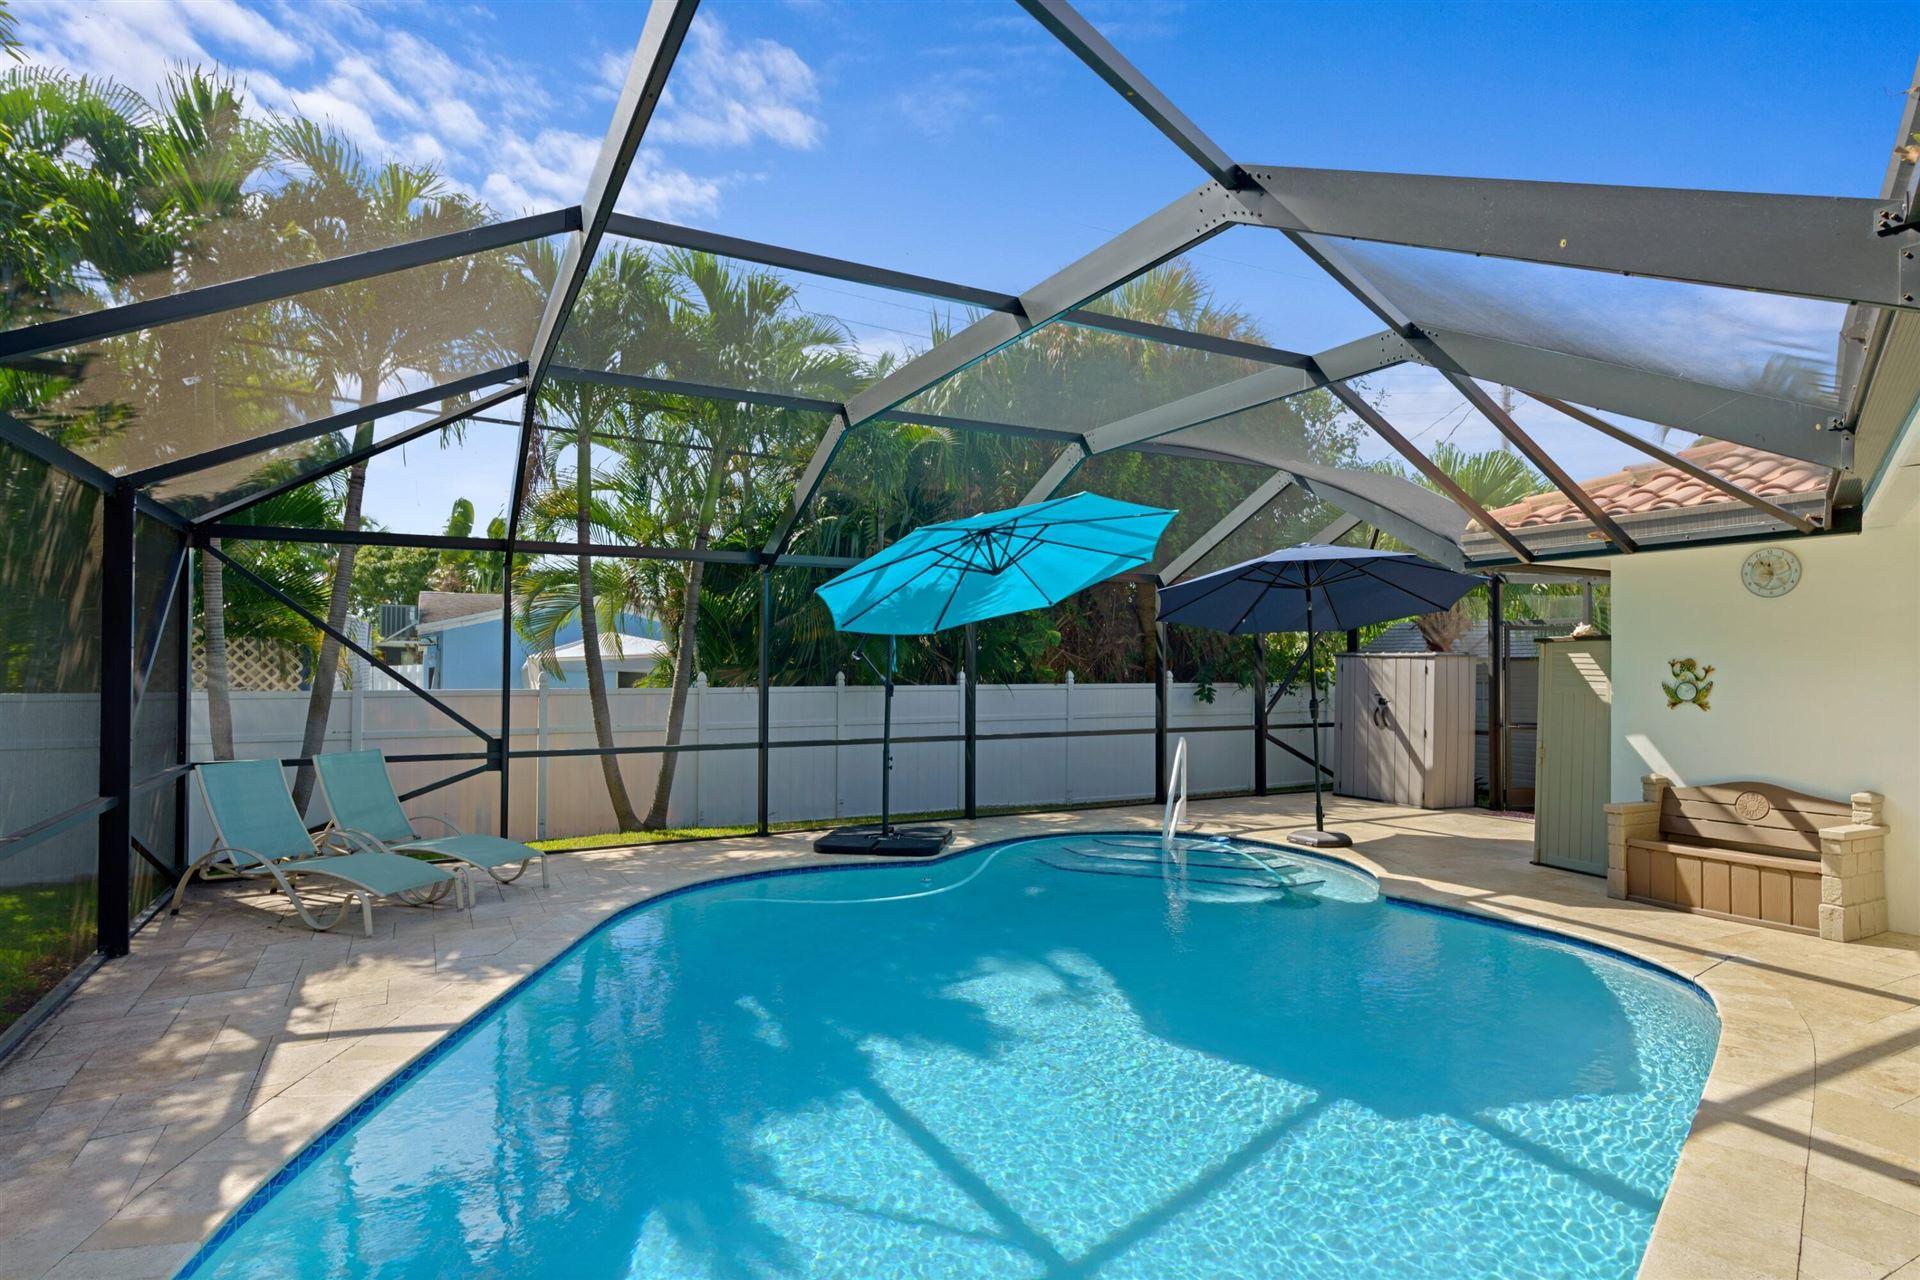 Photo of 274 NE 24th Court, Boca Raton, FL 33431 (MLS # RX-10753644)